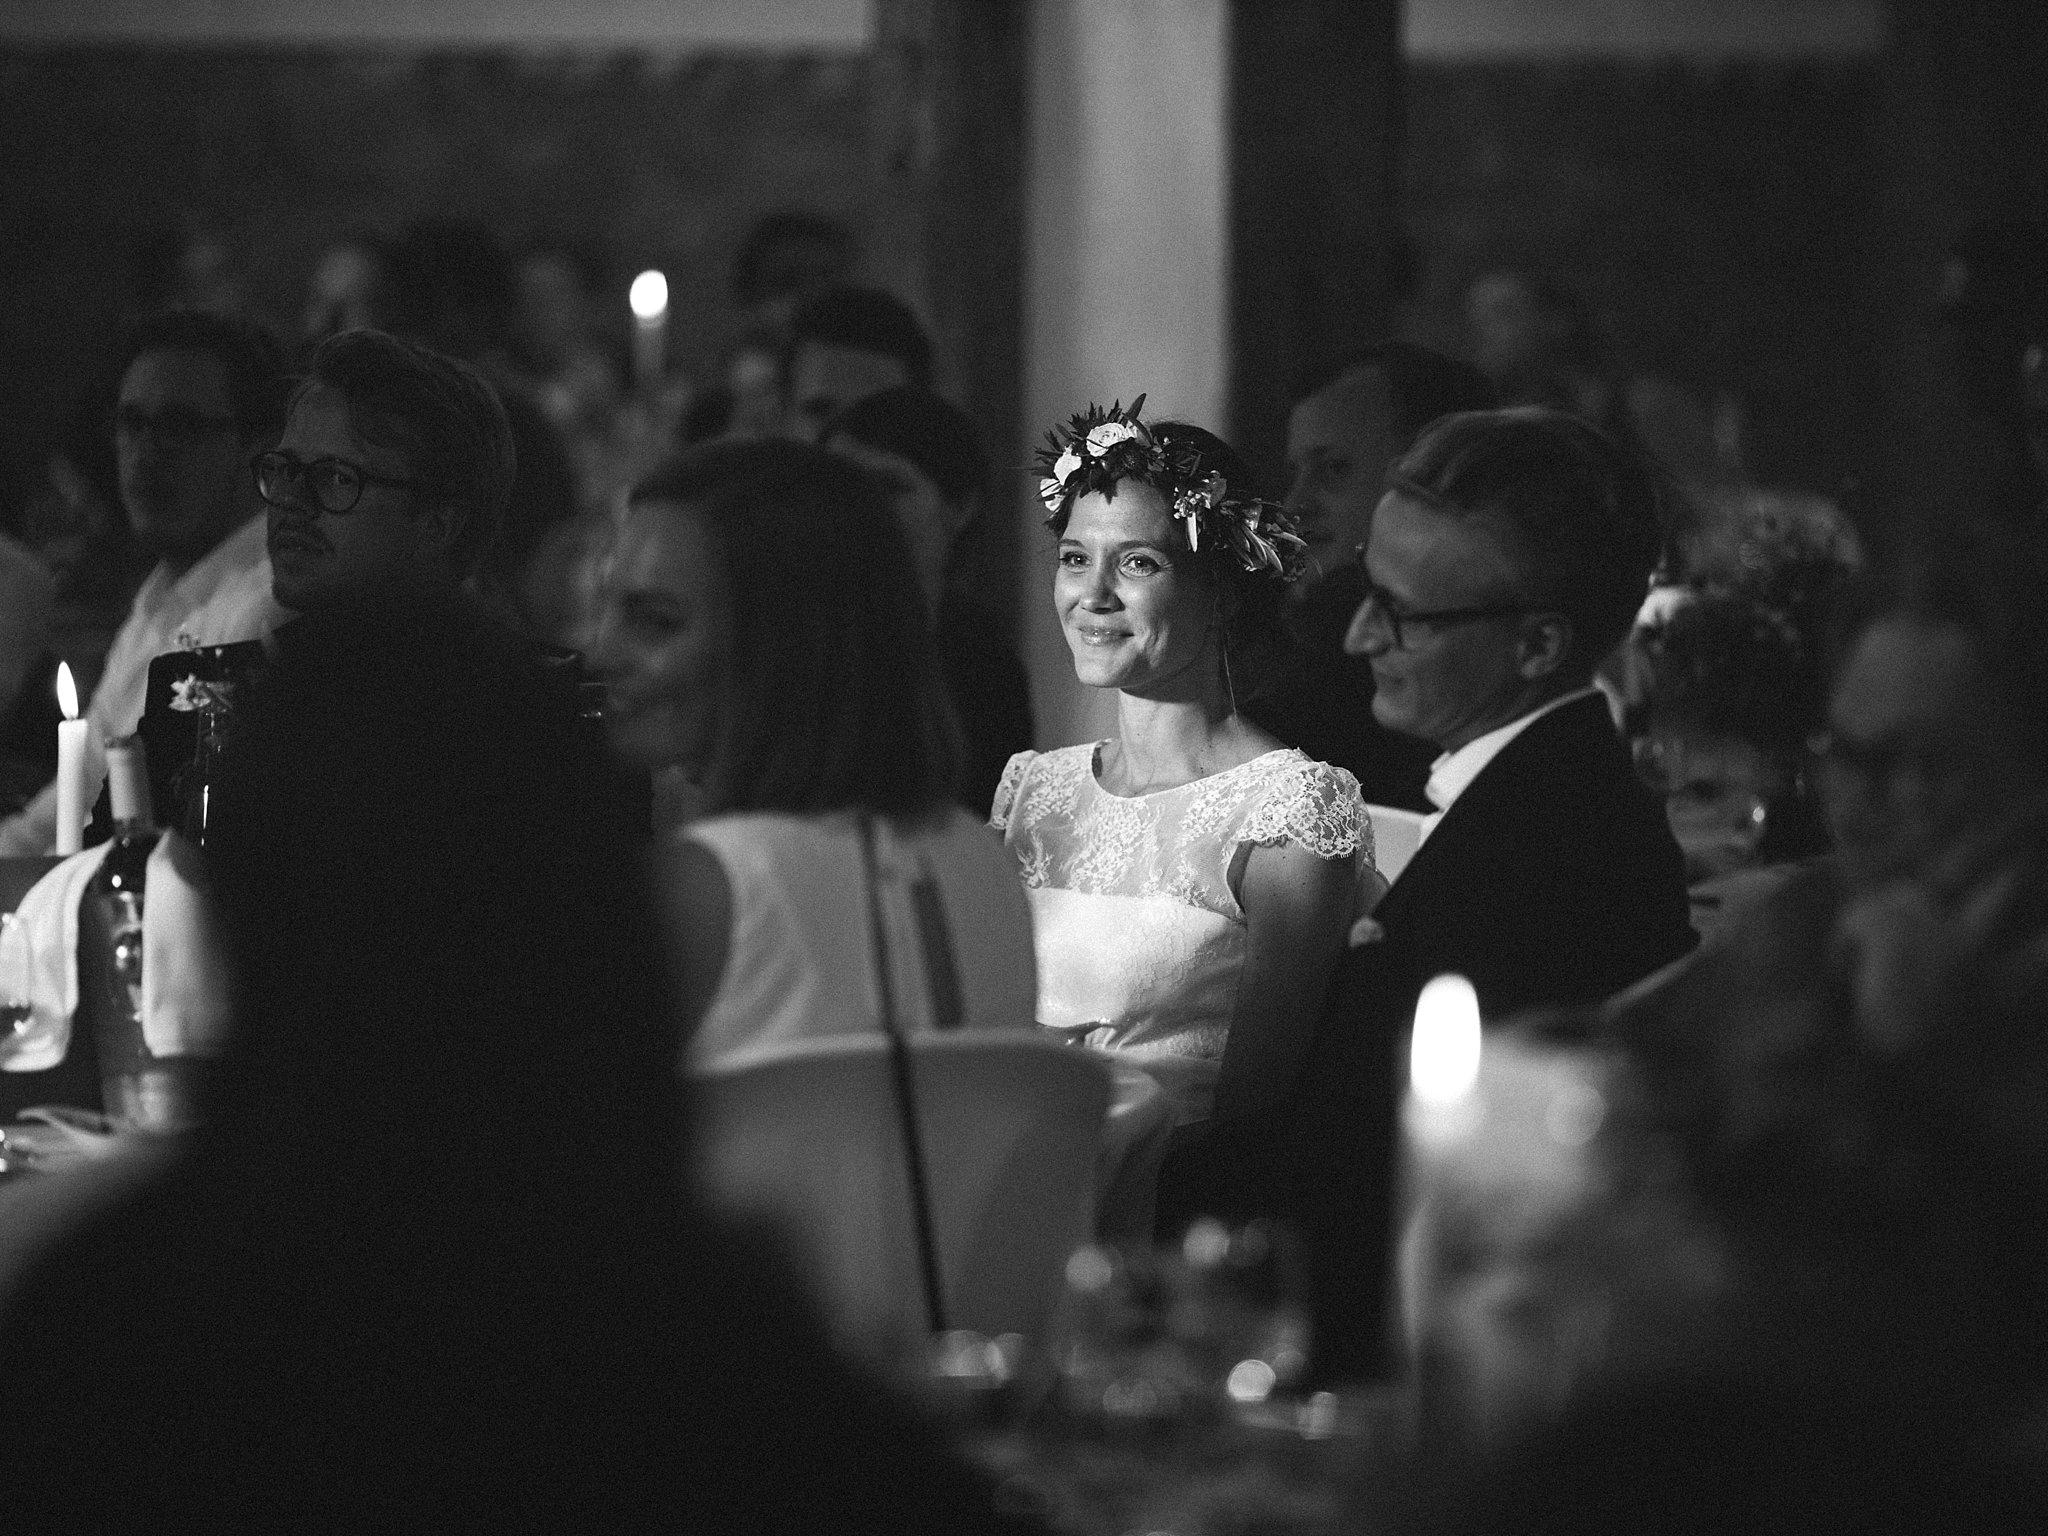 Wedding Photographer Perpignan - Château Las Collas Wedding - Hugo Hennequin106.jpg